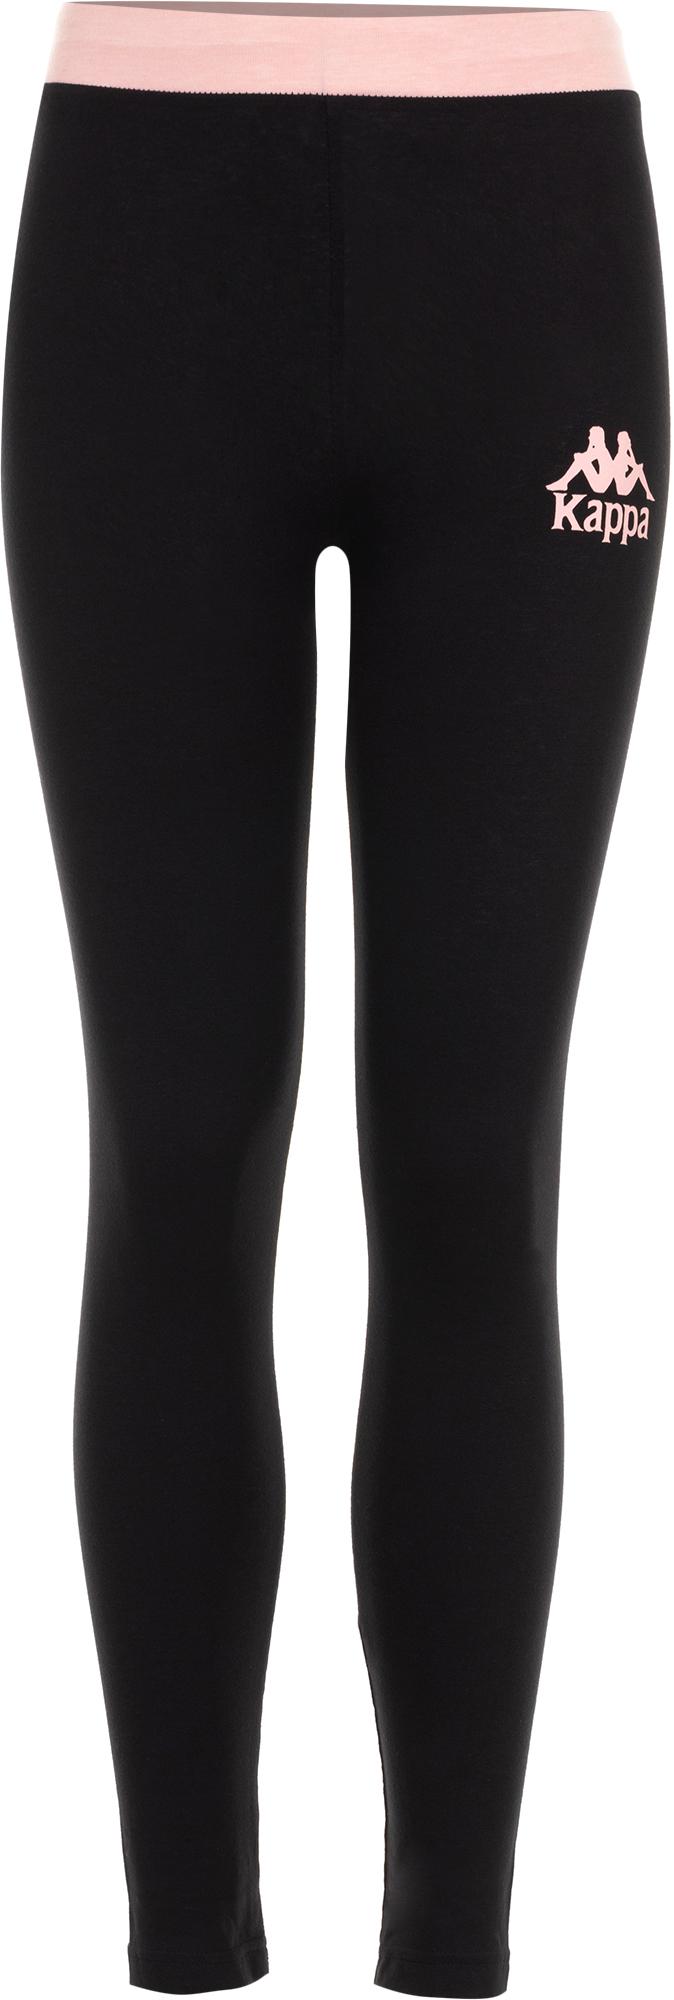 Kappa Легинсы для девочек Kappa, размер 128 kappa брюки для девочек kappa размер 134